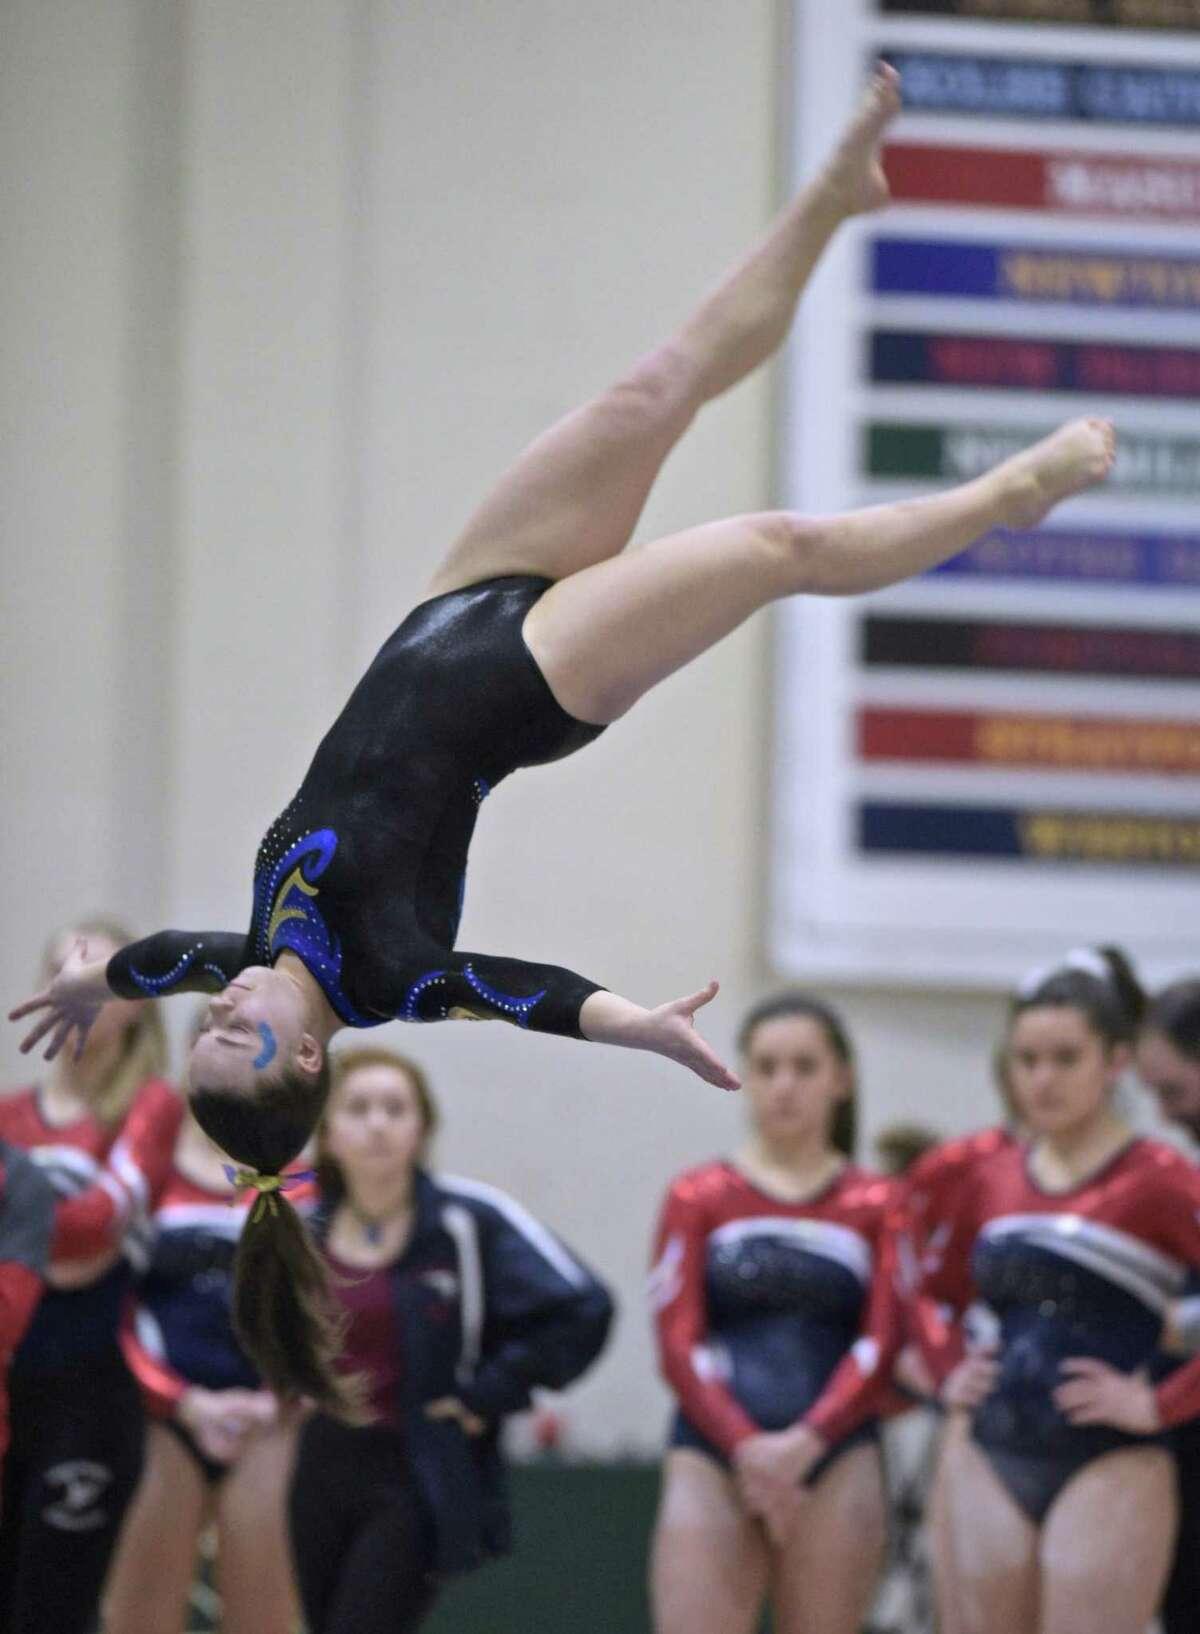 Newtown's Hannah Jojo dismounts from the beam during the SWC girls high school gymnastics championships at New Milford High School, New Milford, Conn, Thursday, February 7, 2019.